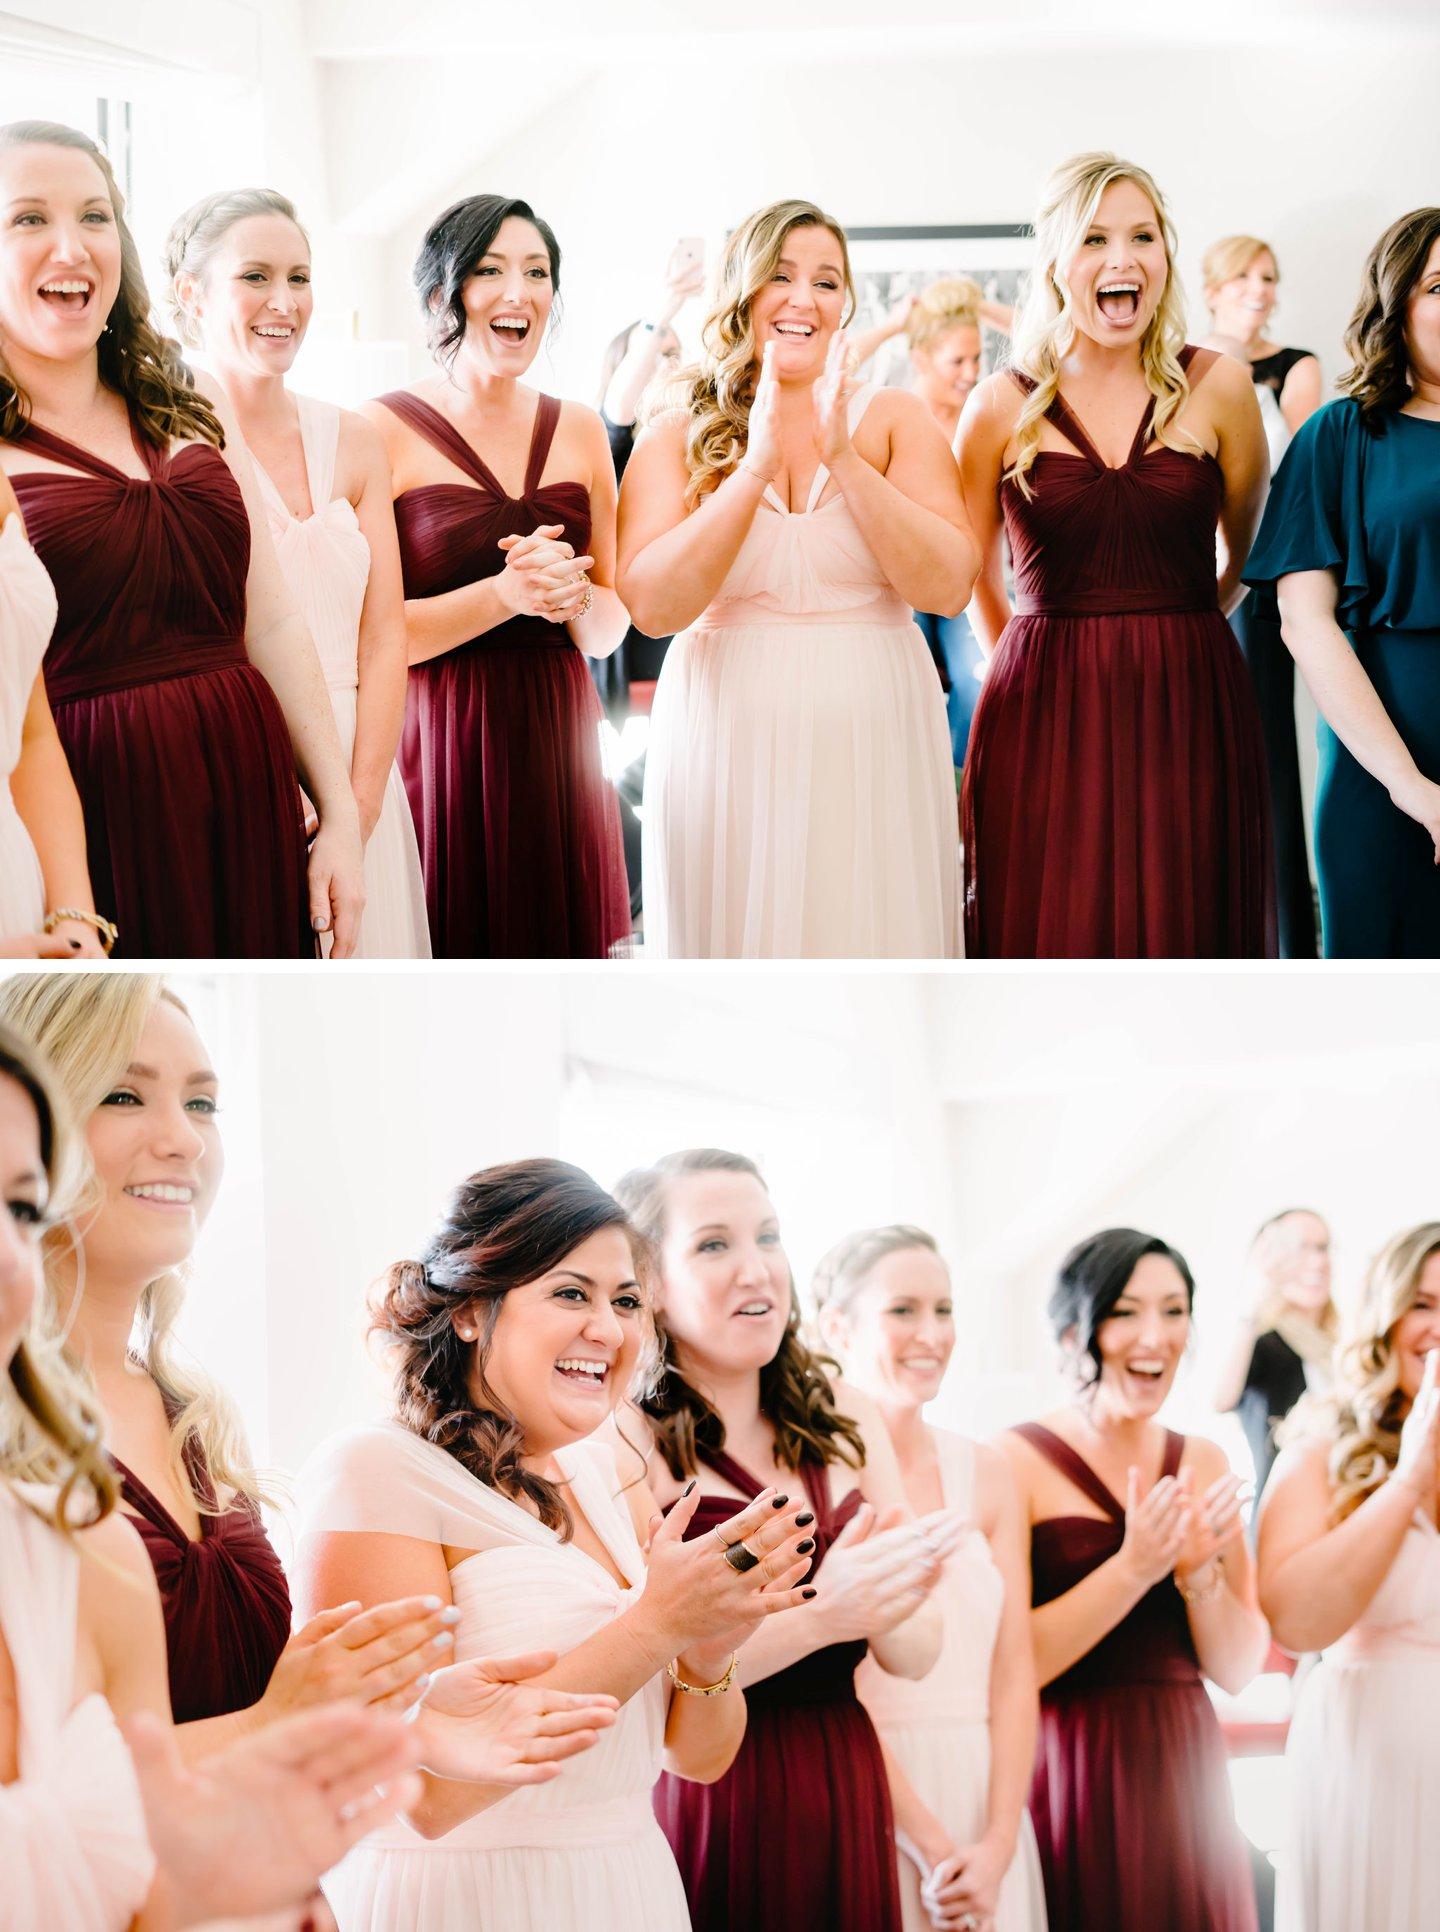 lake-geneva-fine-art-wedding-photographer-jefferson13